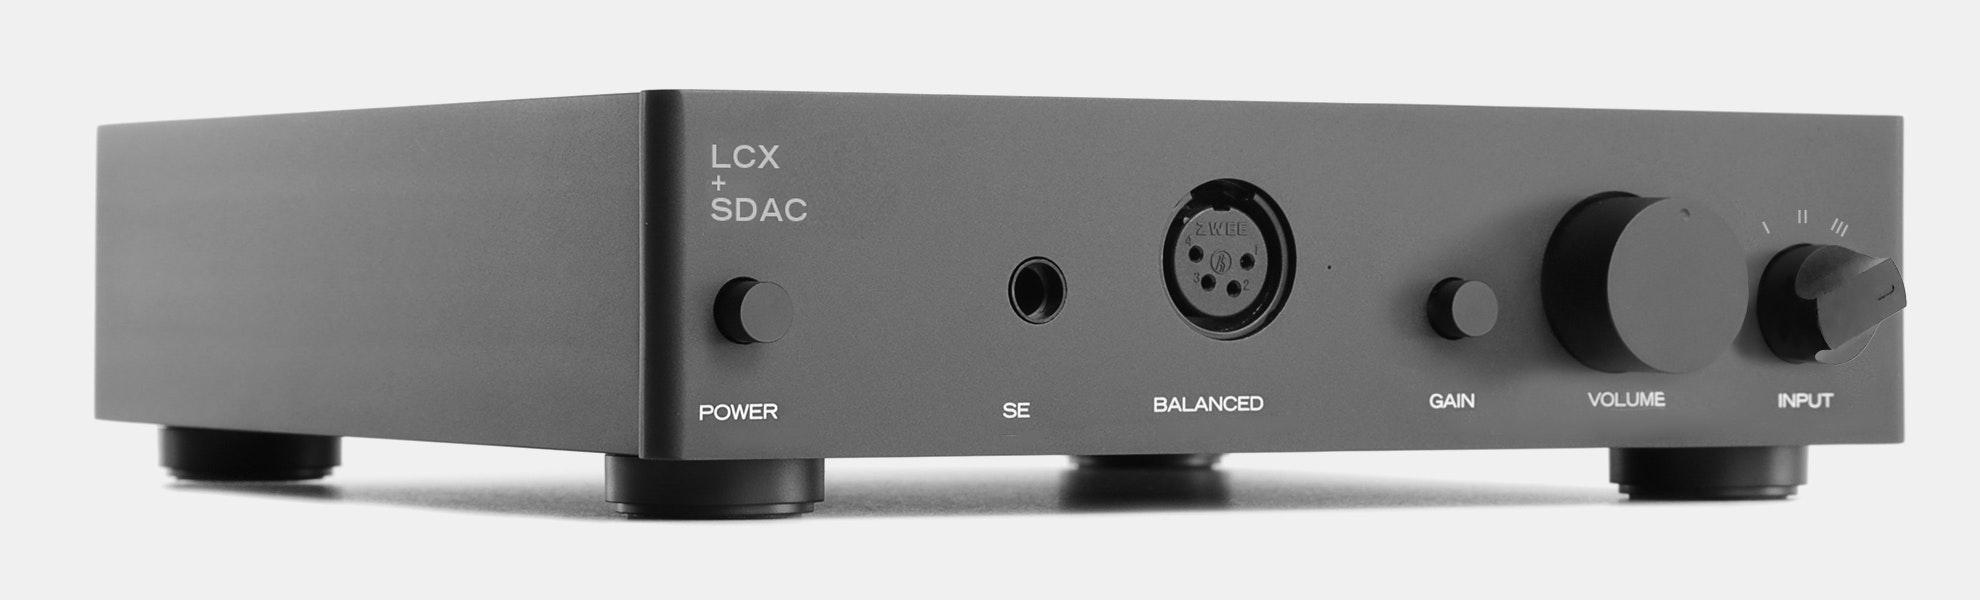 Massdrop Liquid Carbon X + SDAC DAC/Amp